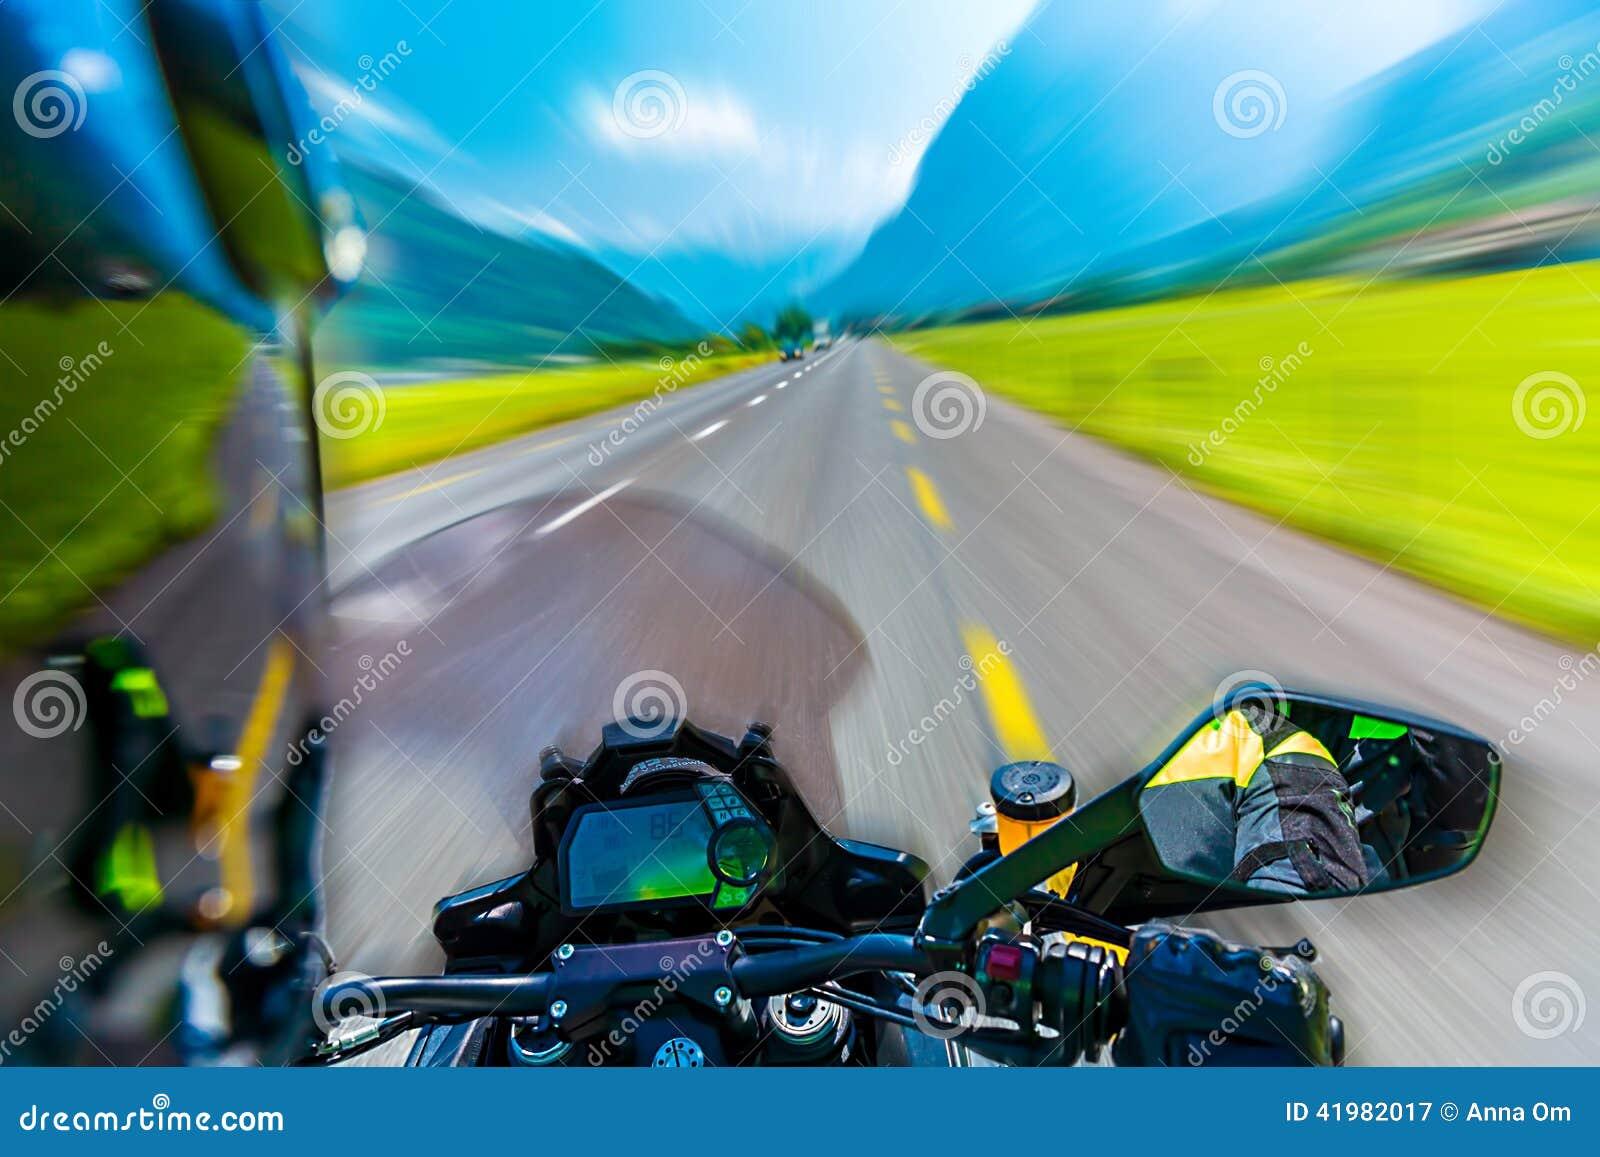 Slow motion of motorbike